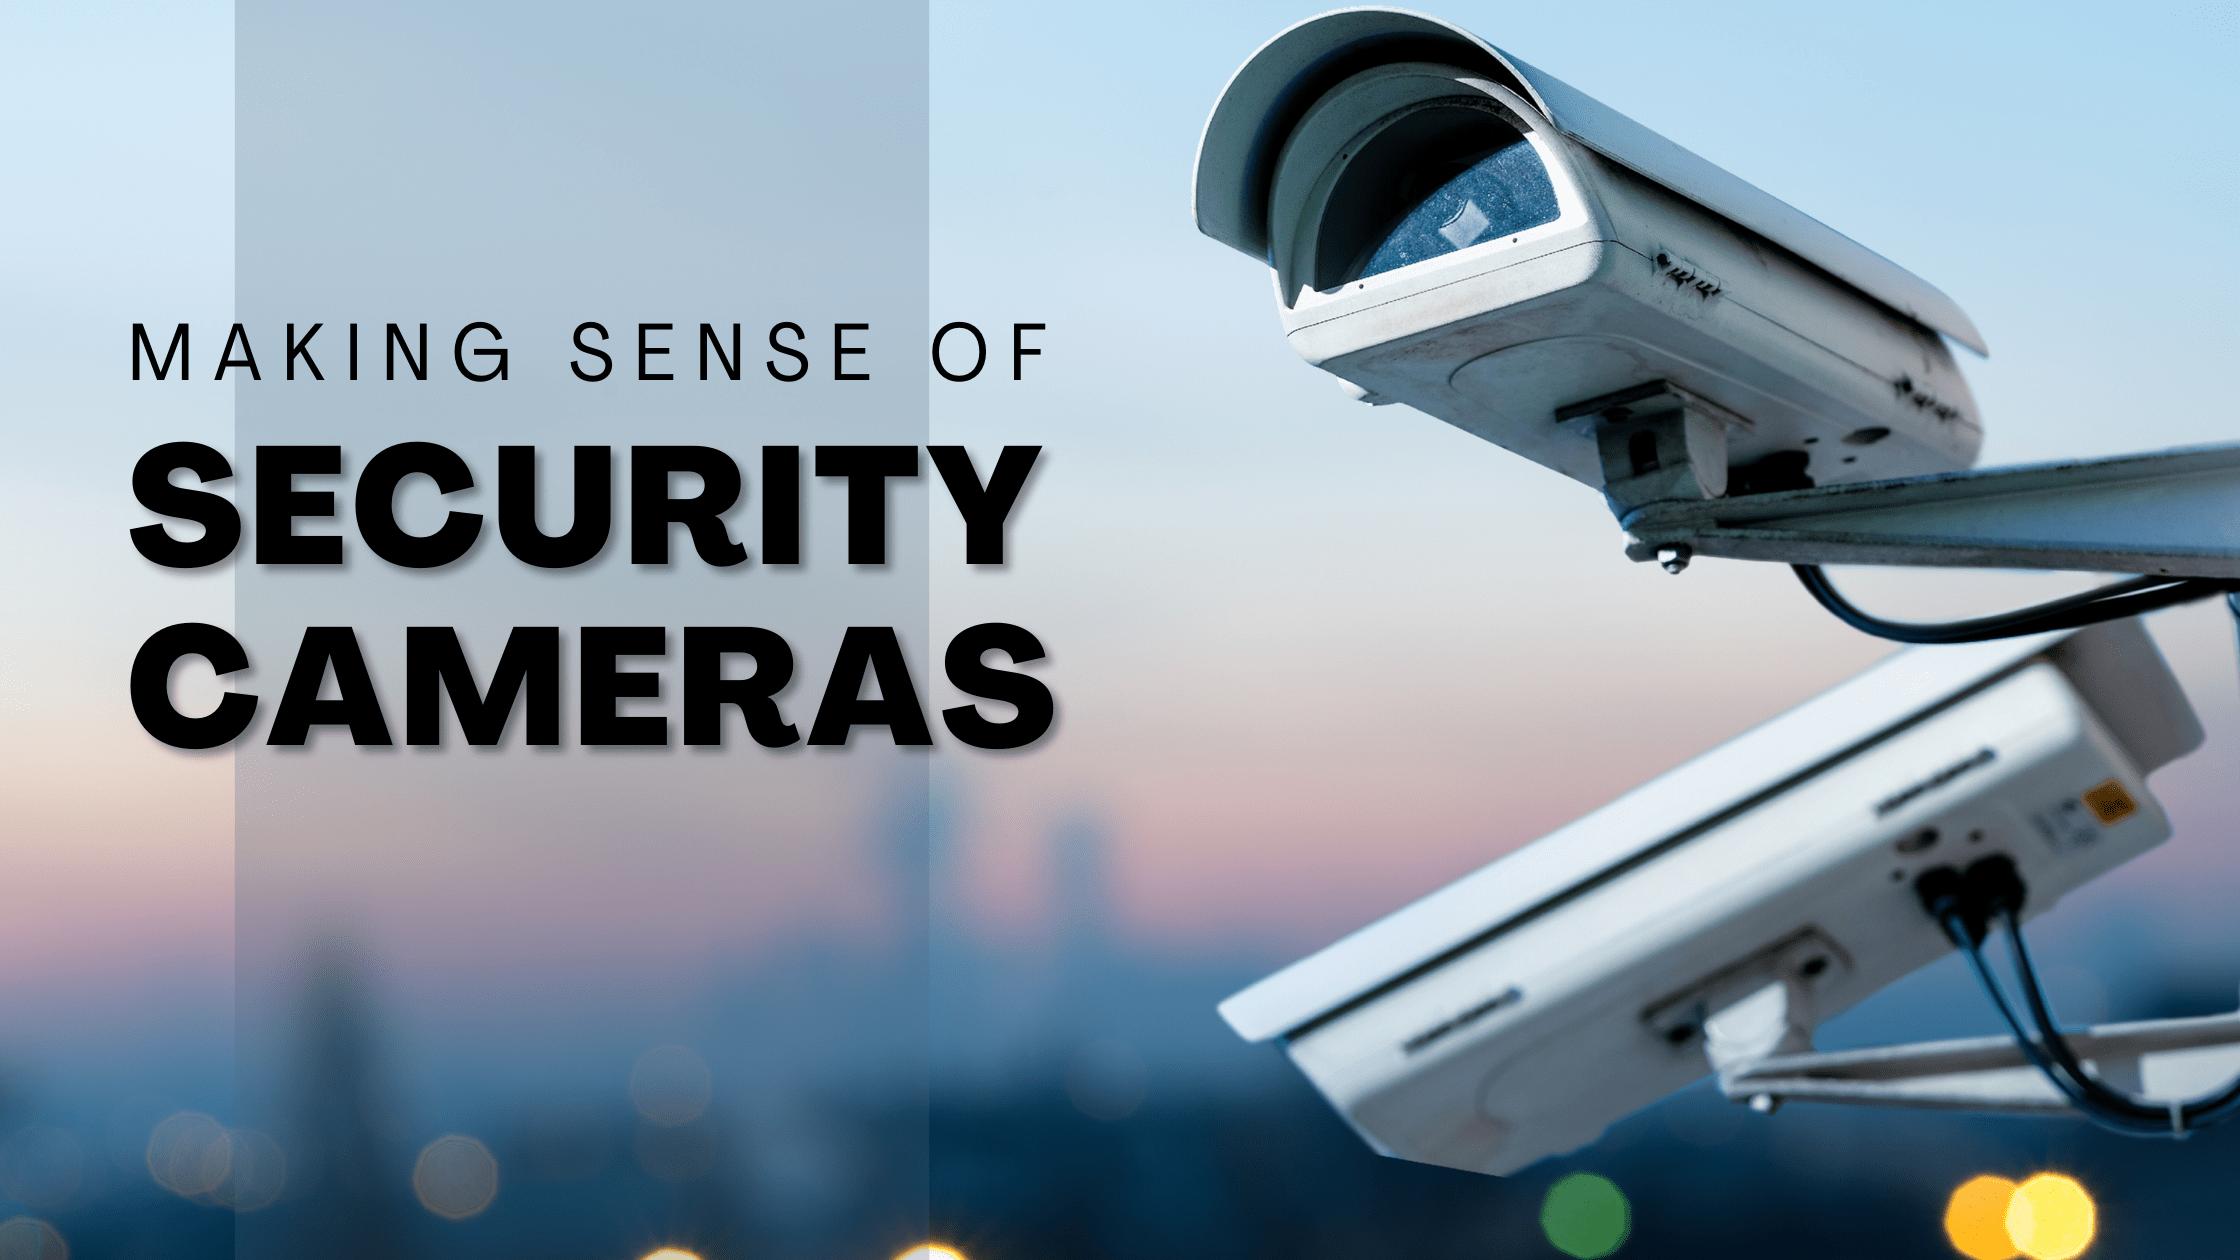 Making Sense of Security Cameras